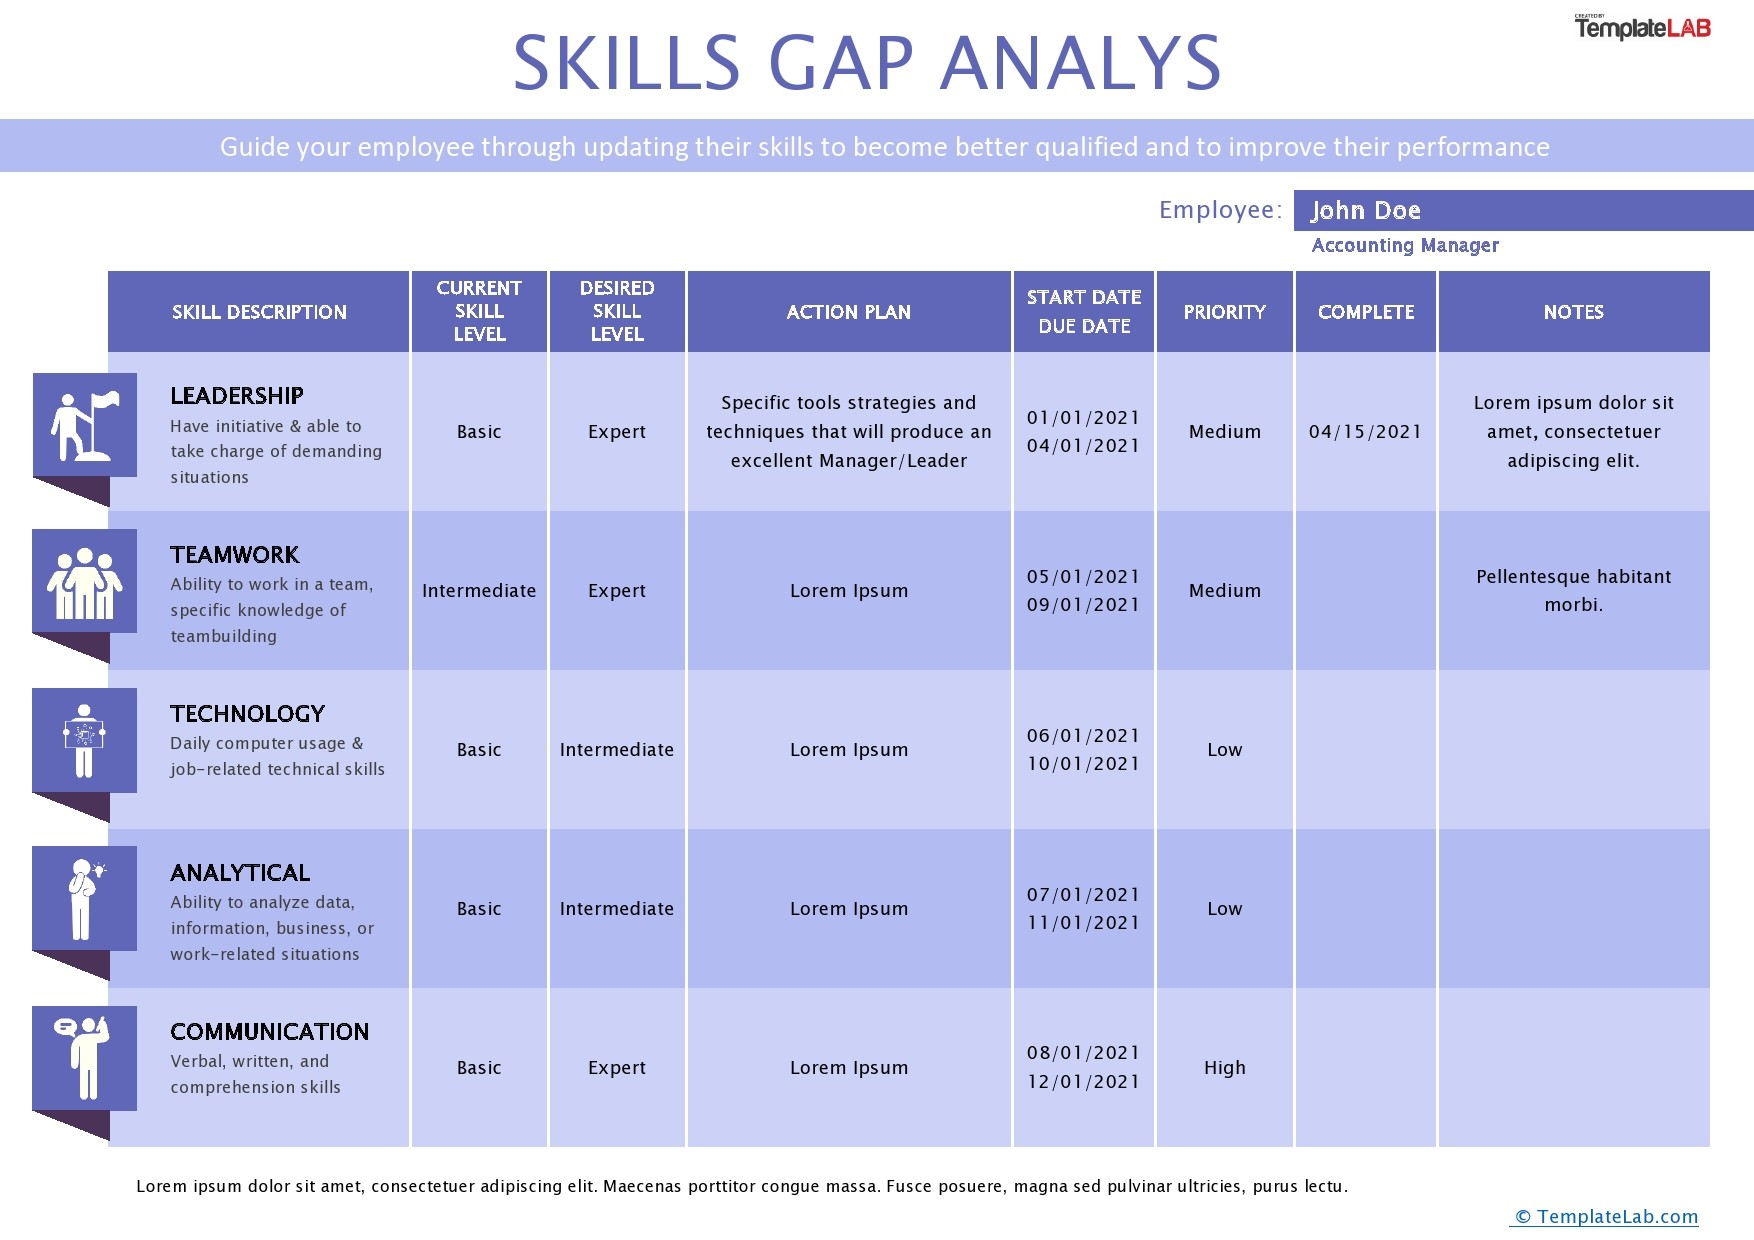 Free Skills Gap Analysis Template - TemplateLab.com